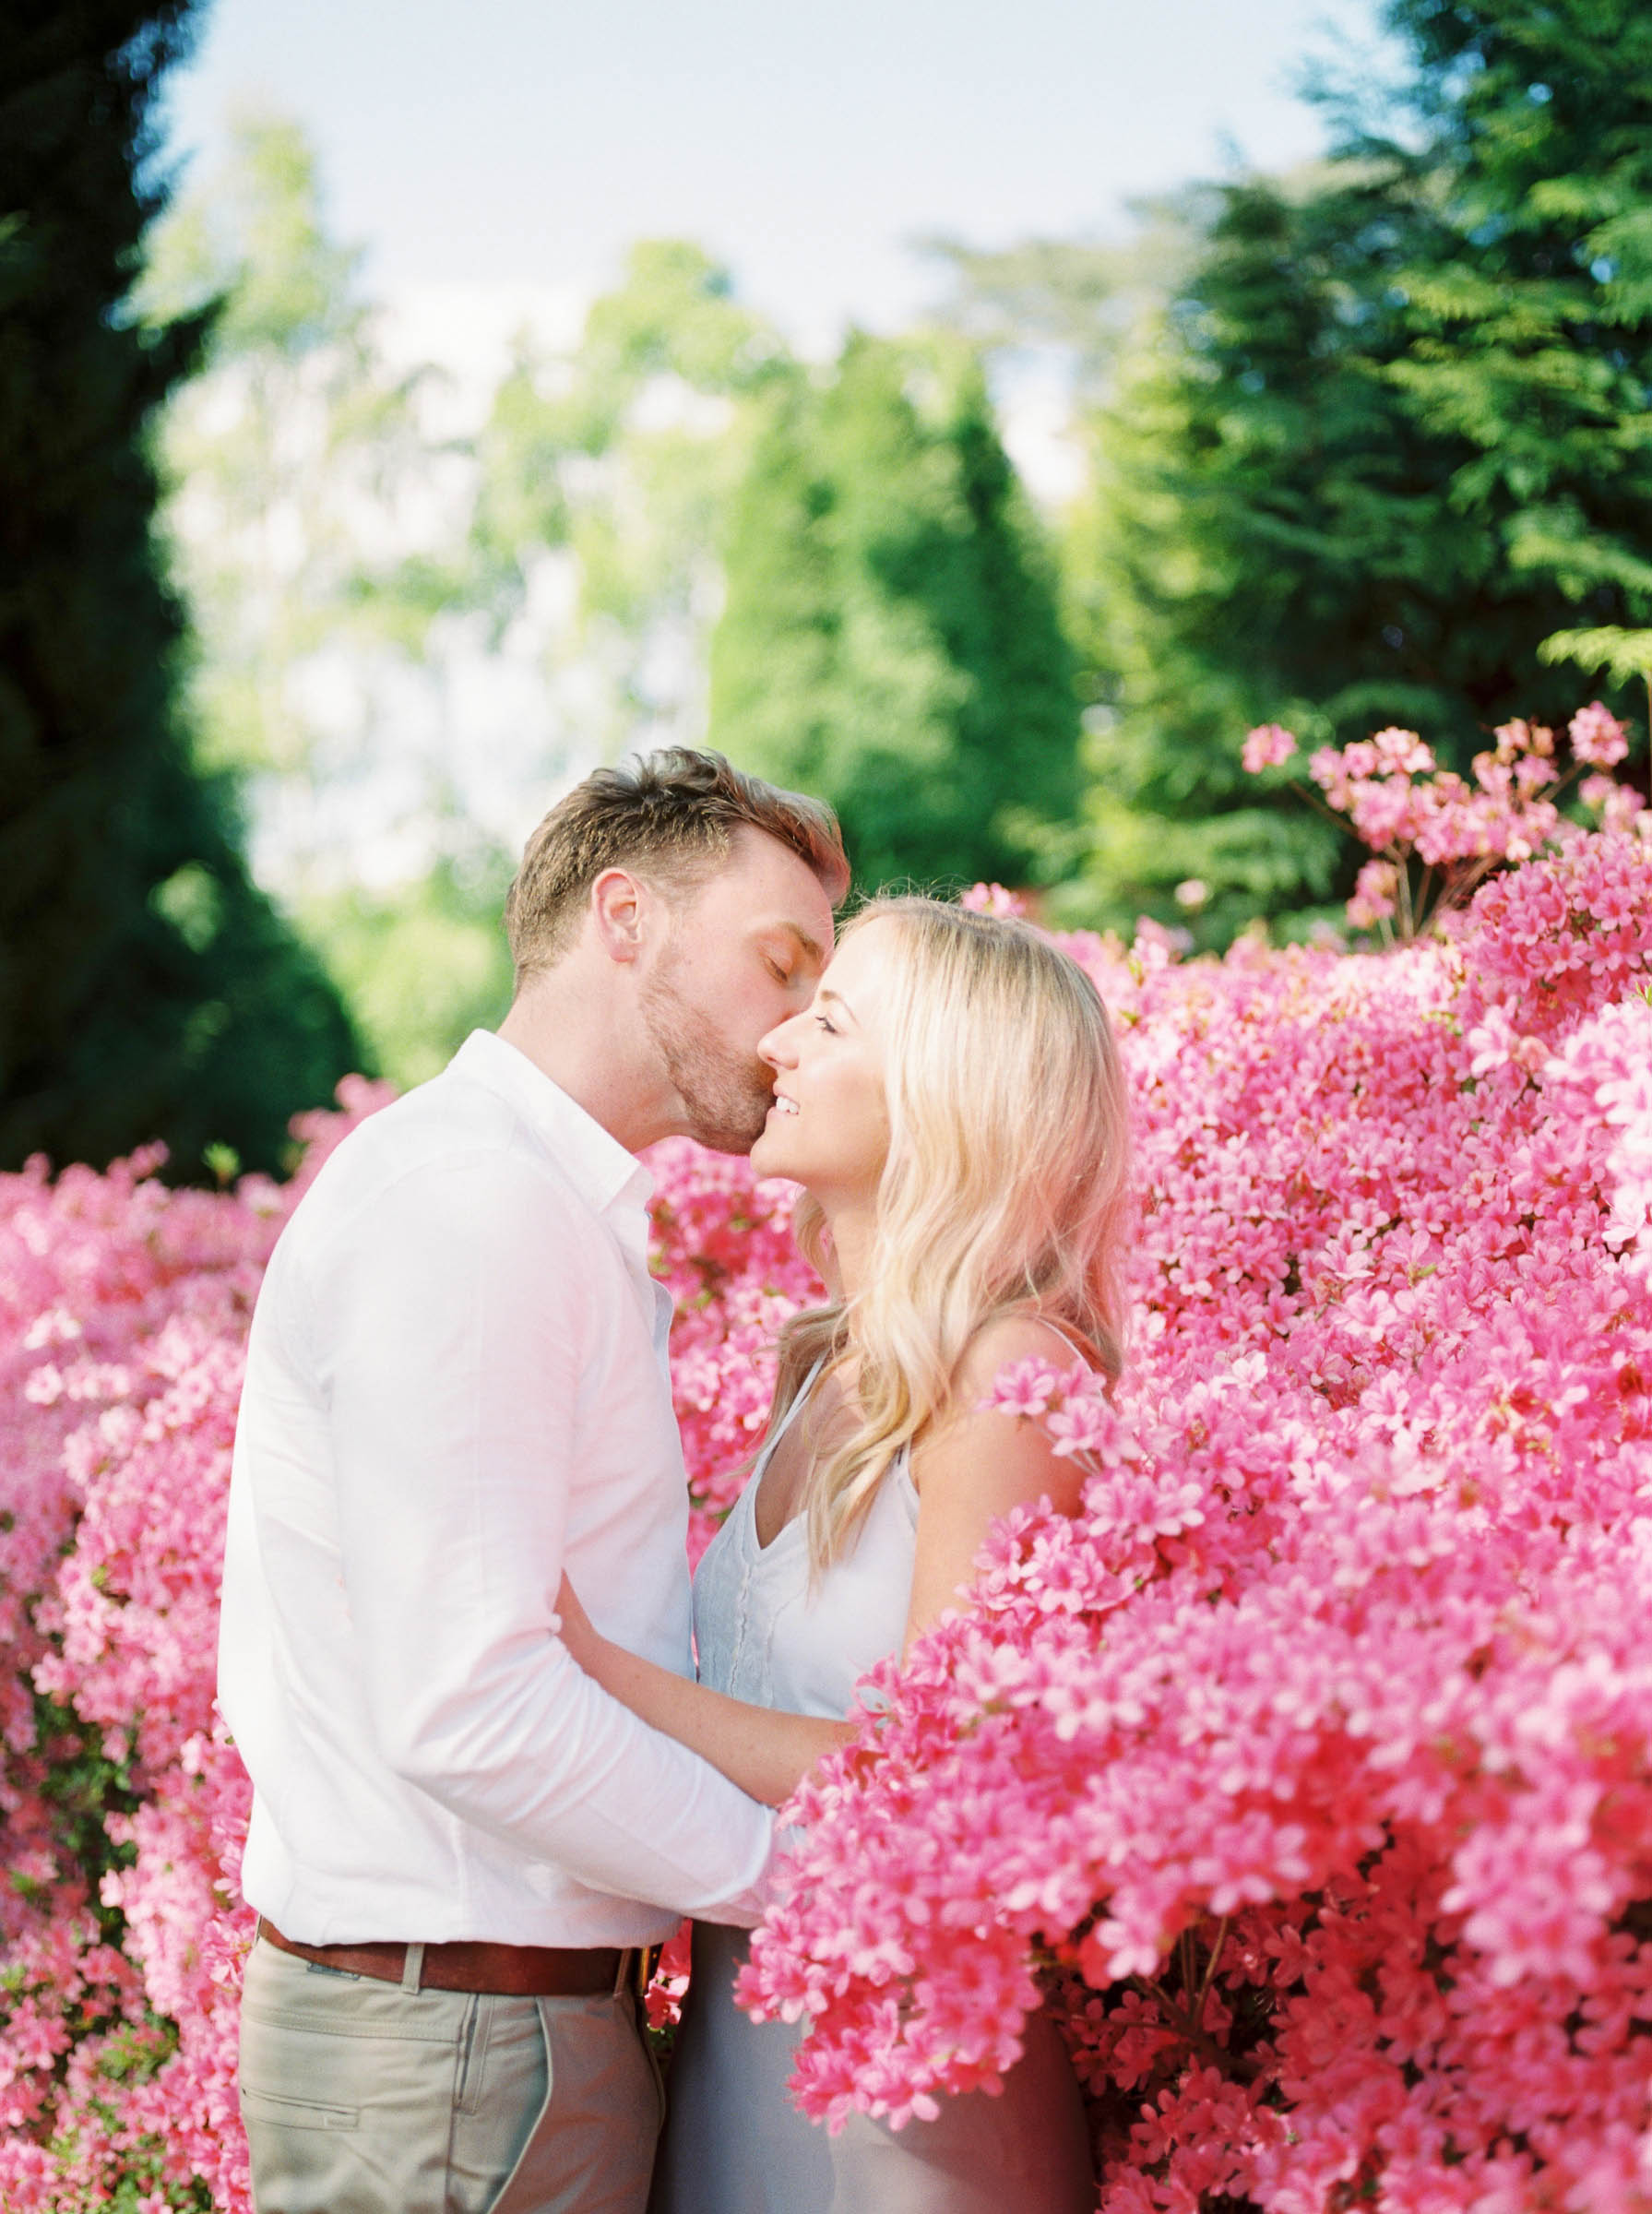 Amy O'Boyle Photography- Destination & UK Fine Art Film Wedding Photographer- Sheffield Park Garden National Trust Spring Engagement Shoot-20.jpg